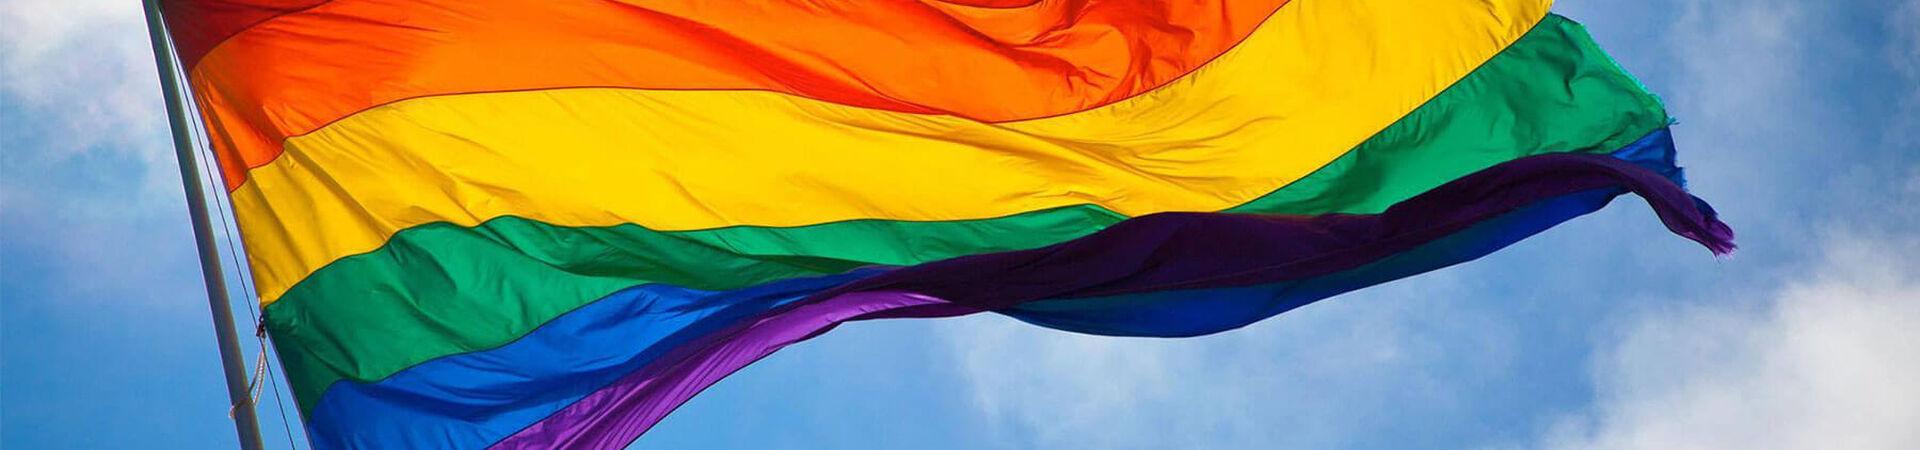 Banner - Love Will Win: Honoring Orlando